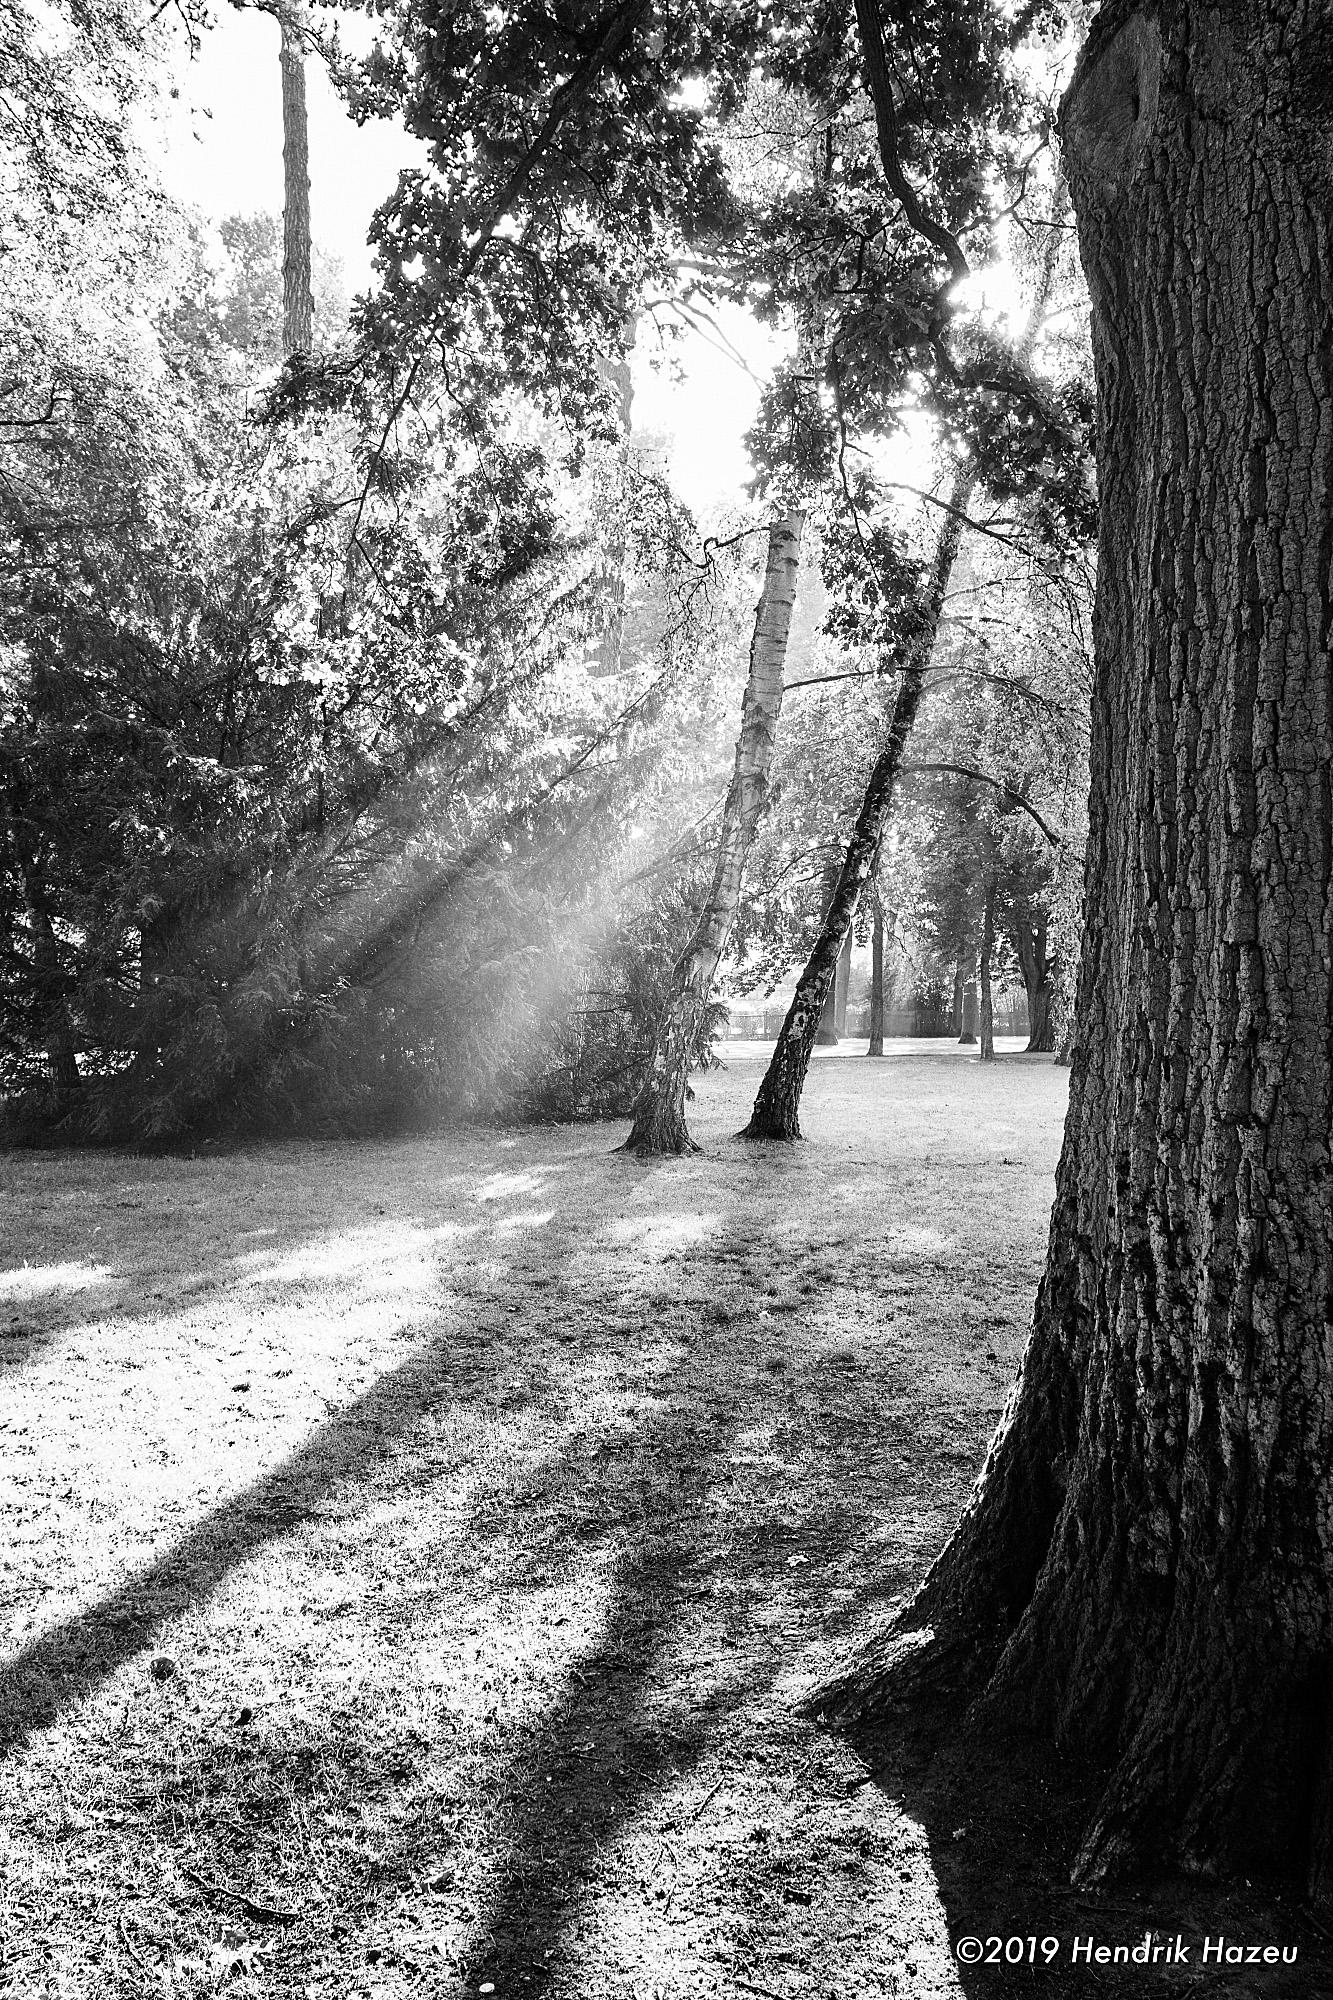 Sun's rays thru the fog follow the shadows, X-Pro2 with XF18 mm F/2 @F/8, 1/14 sec, ISO 200, +1 EV